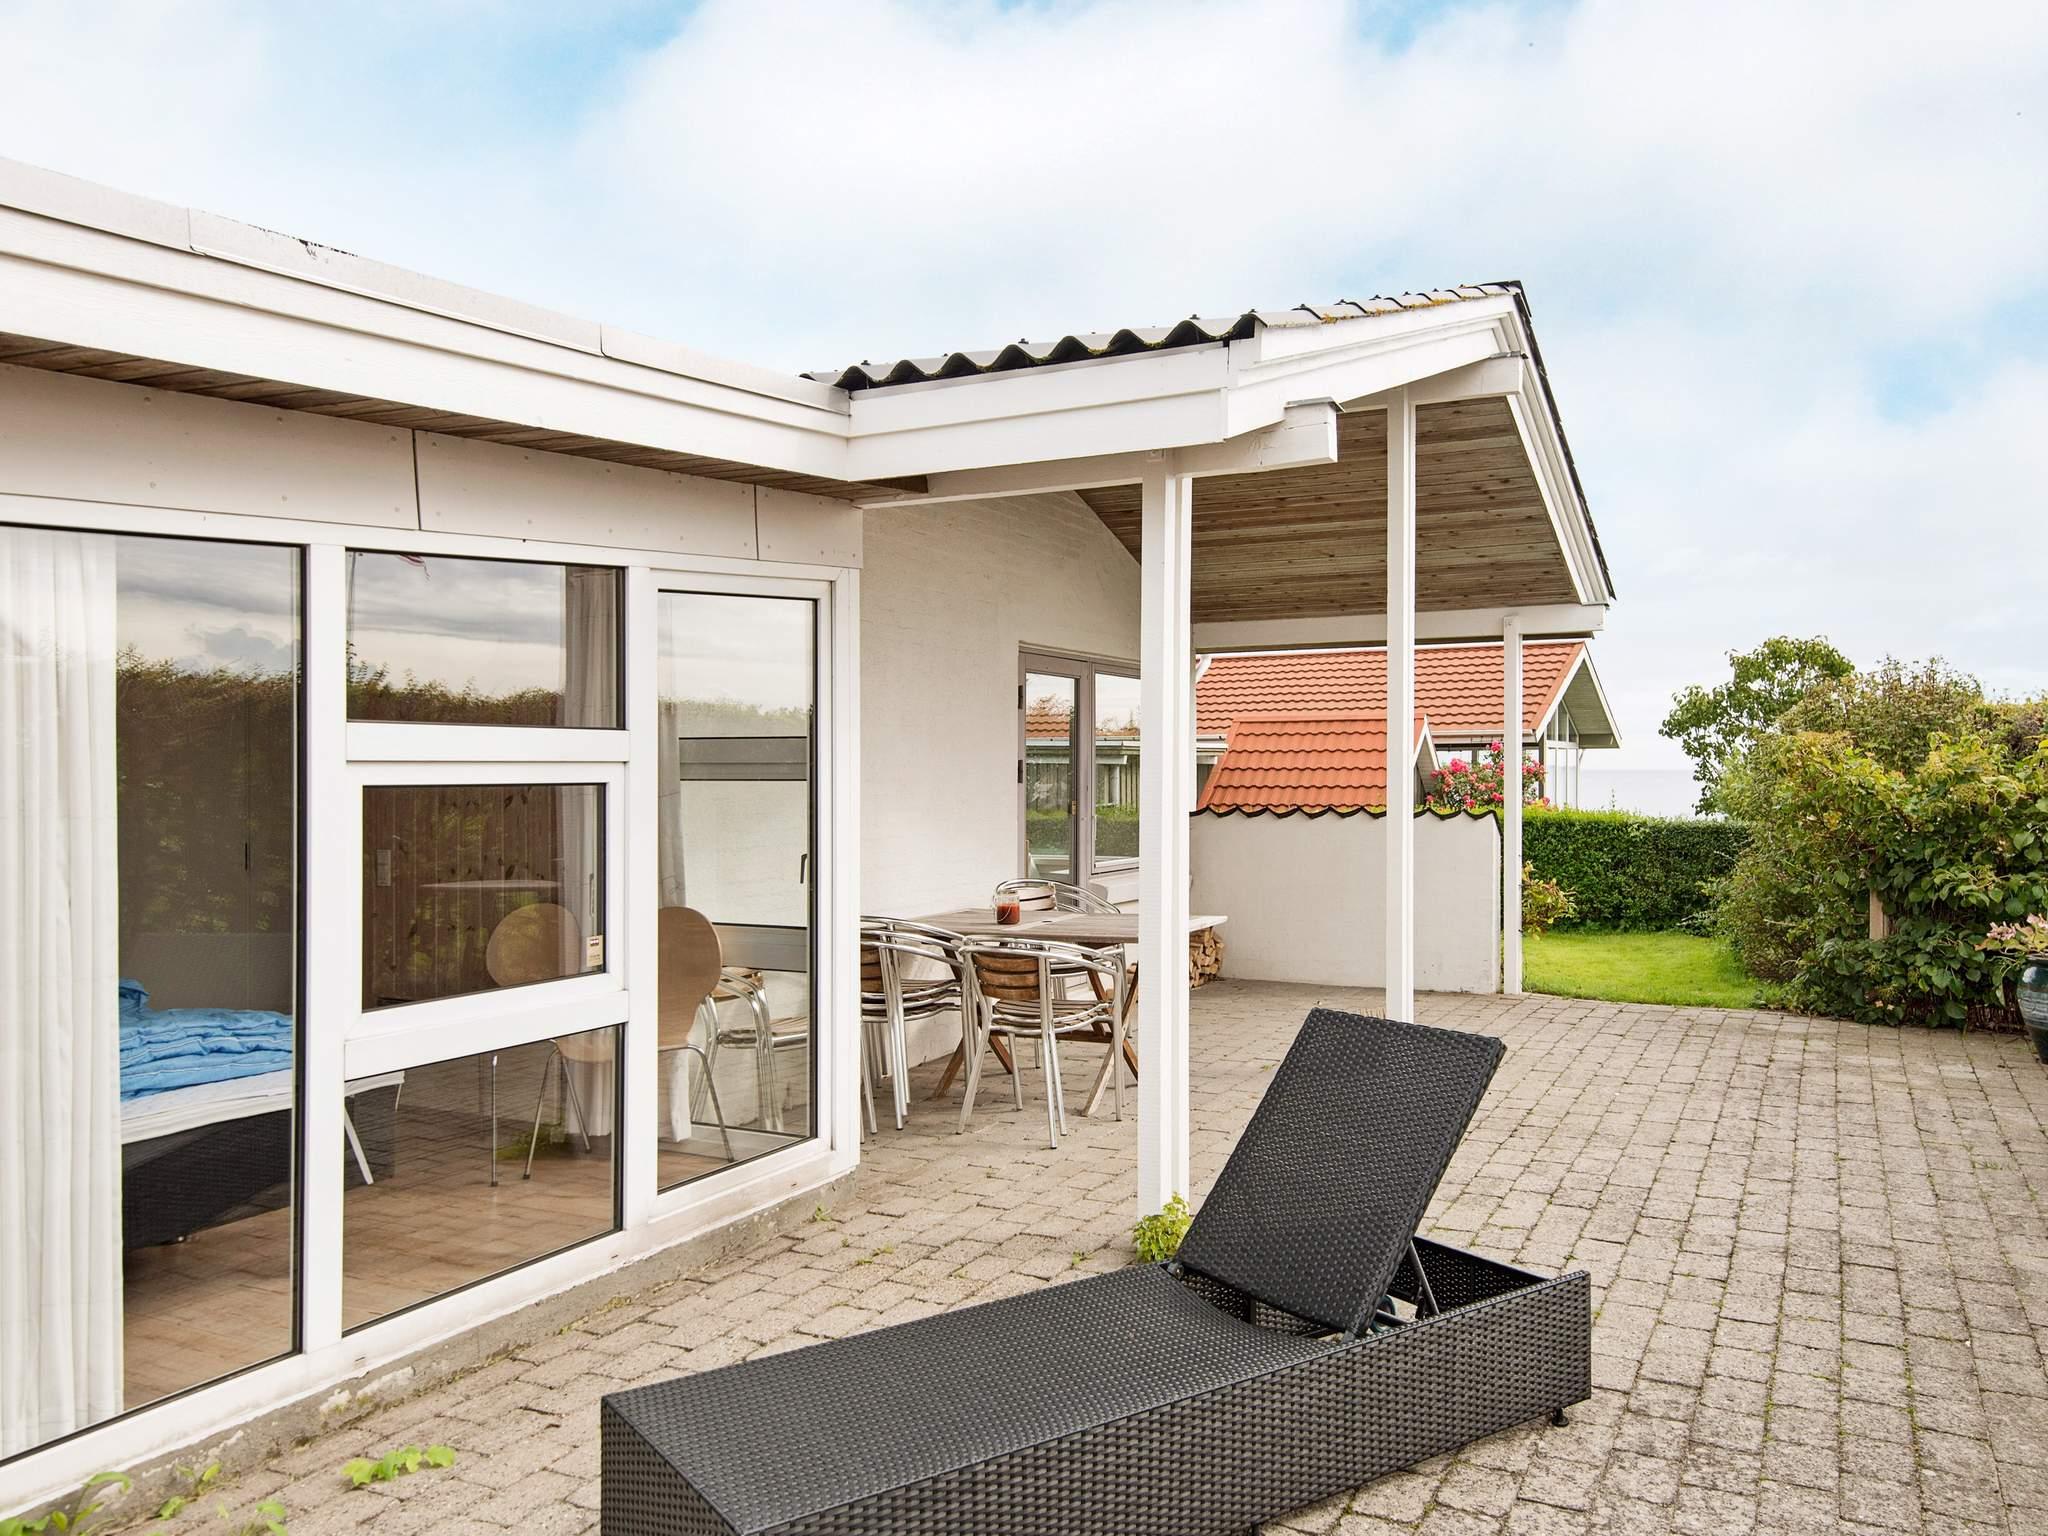 Ferienhaus Ajstrup Strand/Malling (2355032), Ajstrup, , Dänische Ostsee, Dänemark, Bild 18